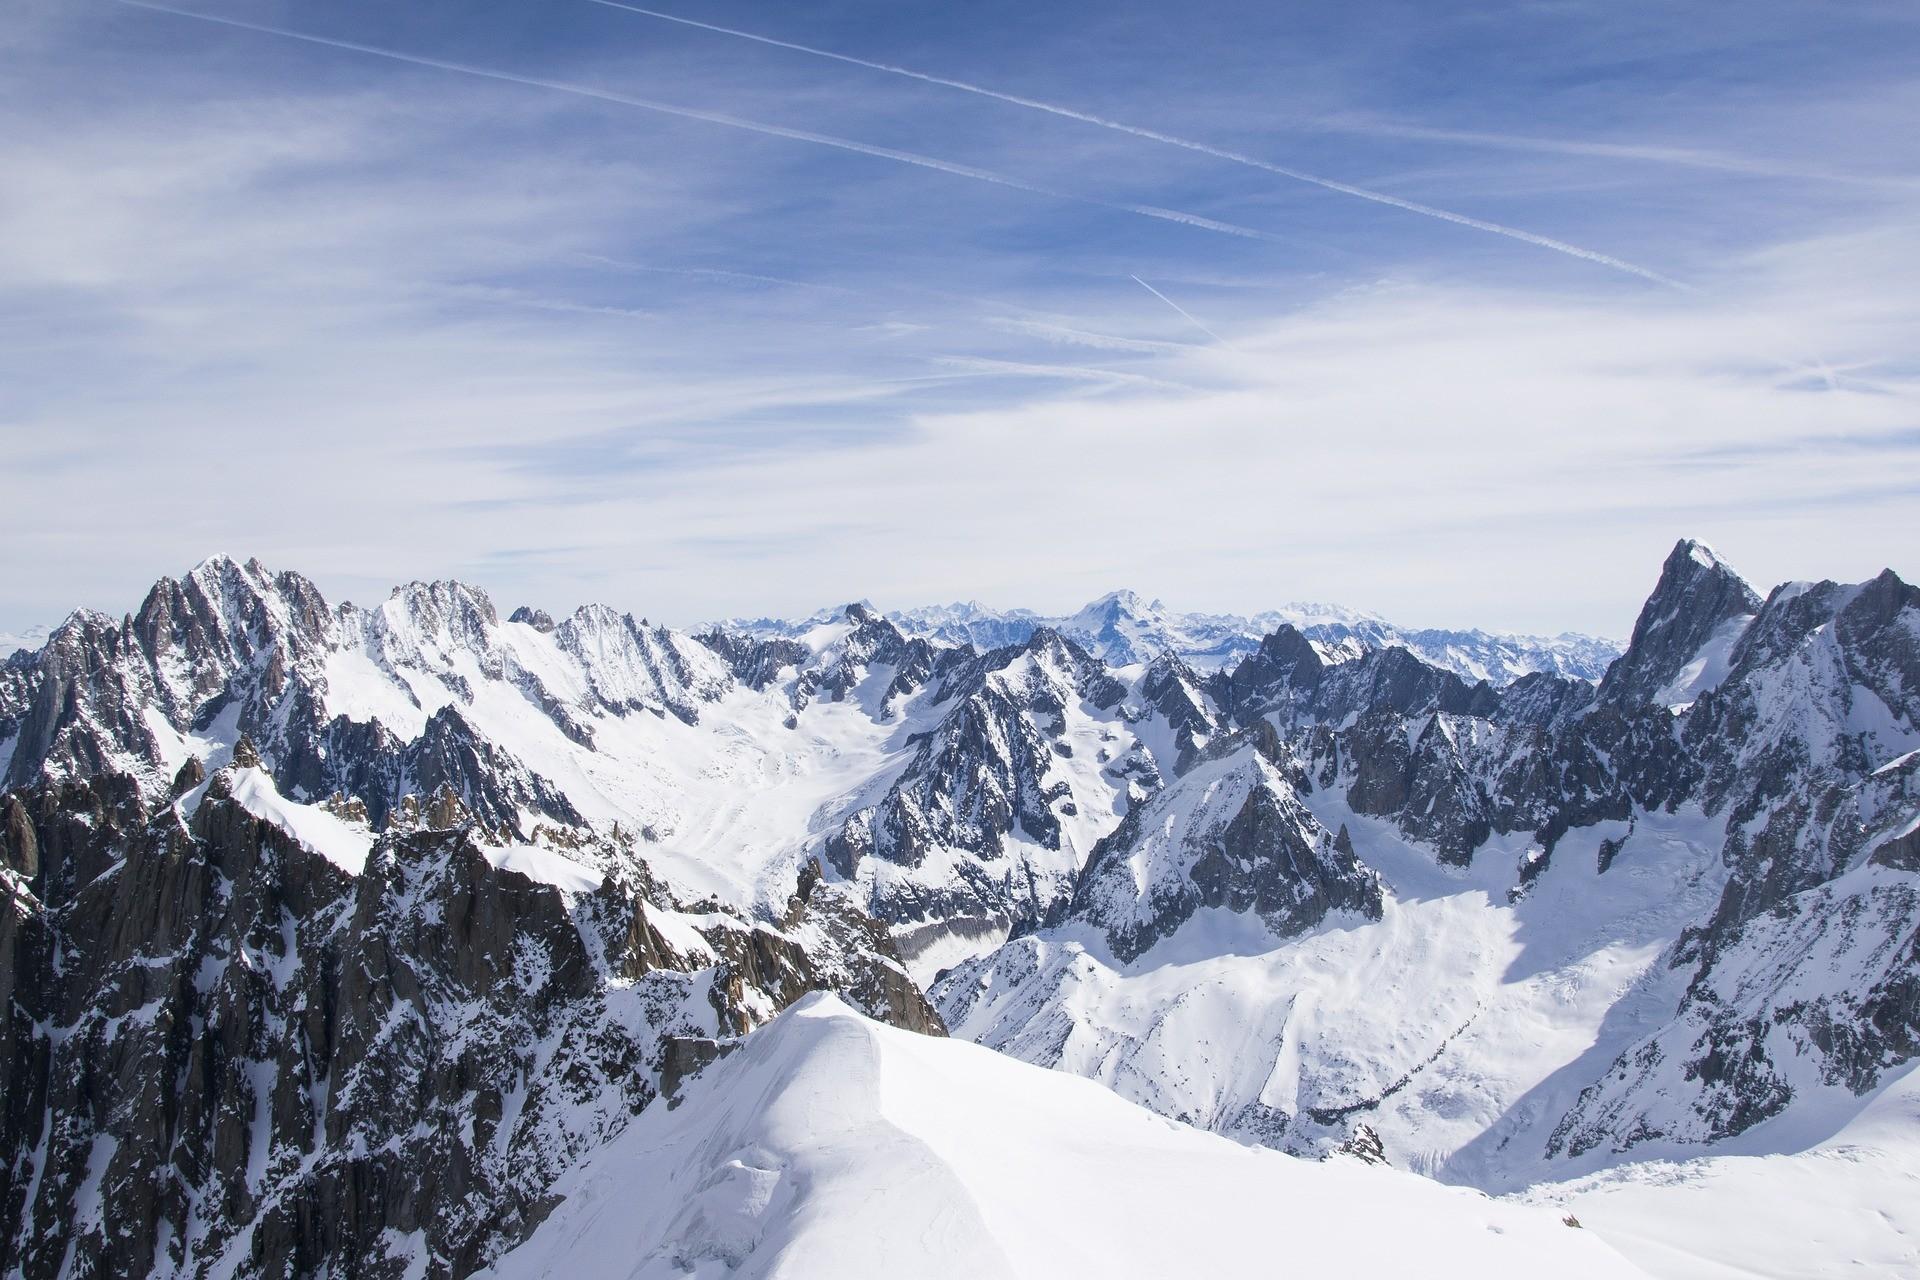 produits-de-beaute-a-emporter-soi-ski